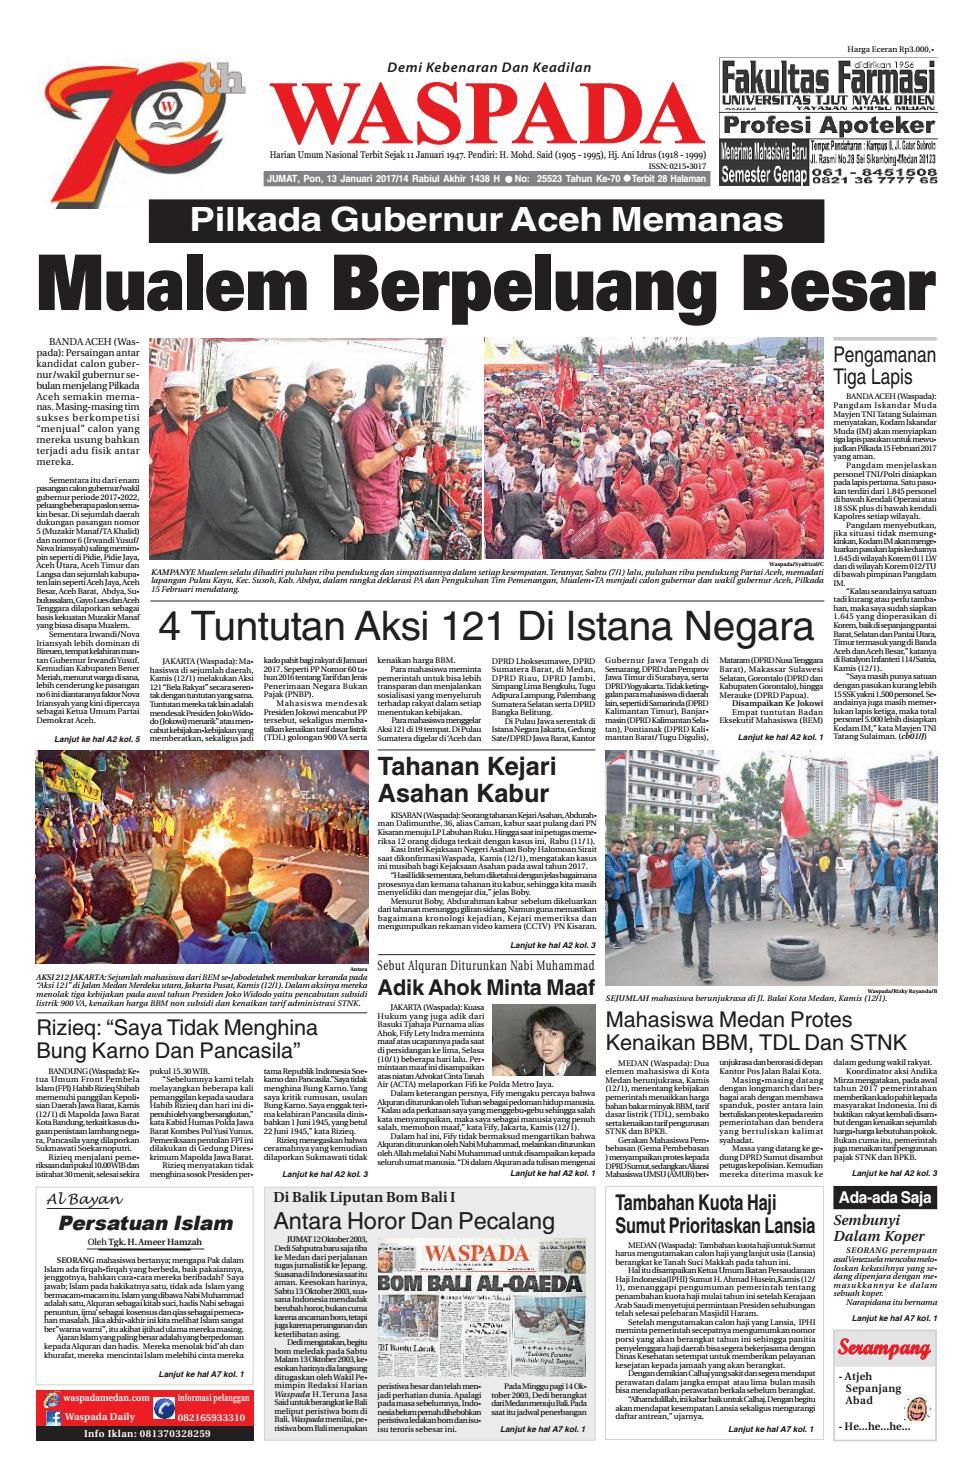 Waspada Jumat 13 Januari 2017 By Harian Waspada Issuu